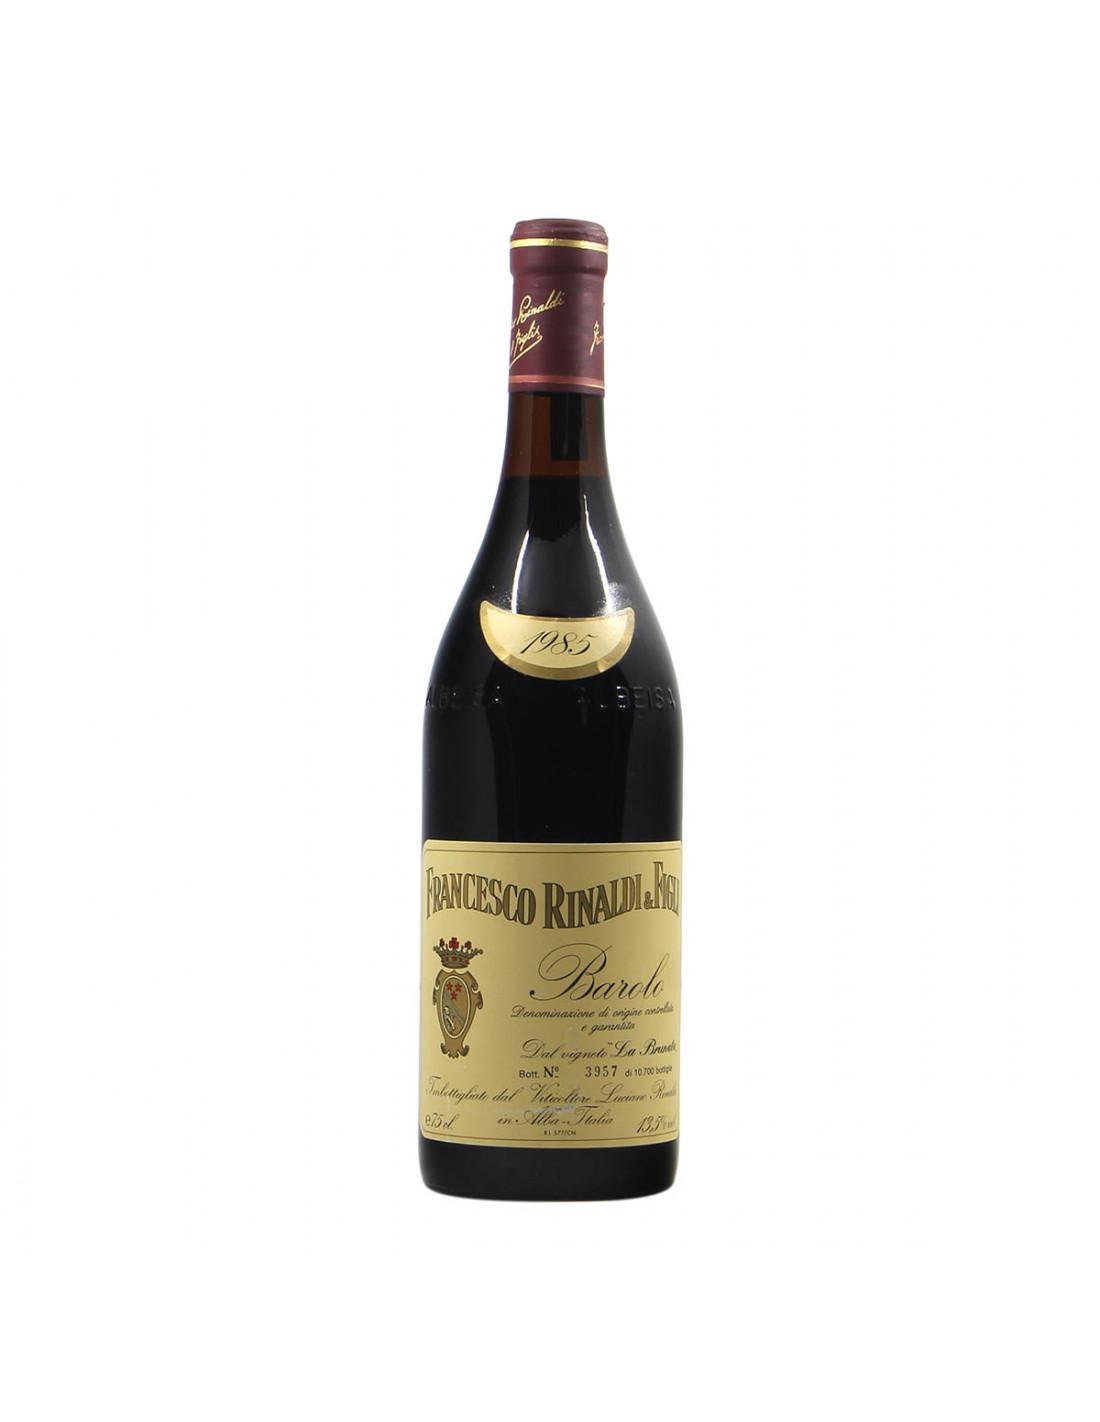 Francesco Rinaldi Barolo Brunate 1985 Grandi Bottiglie